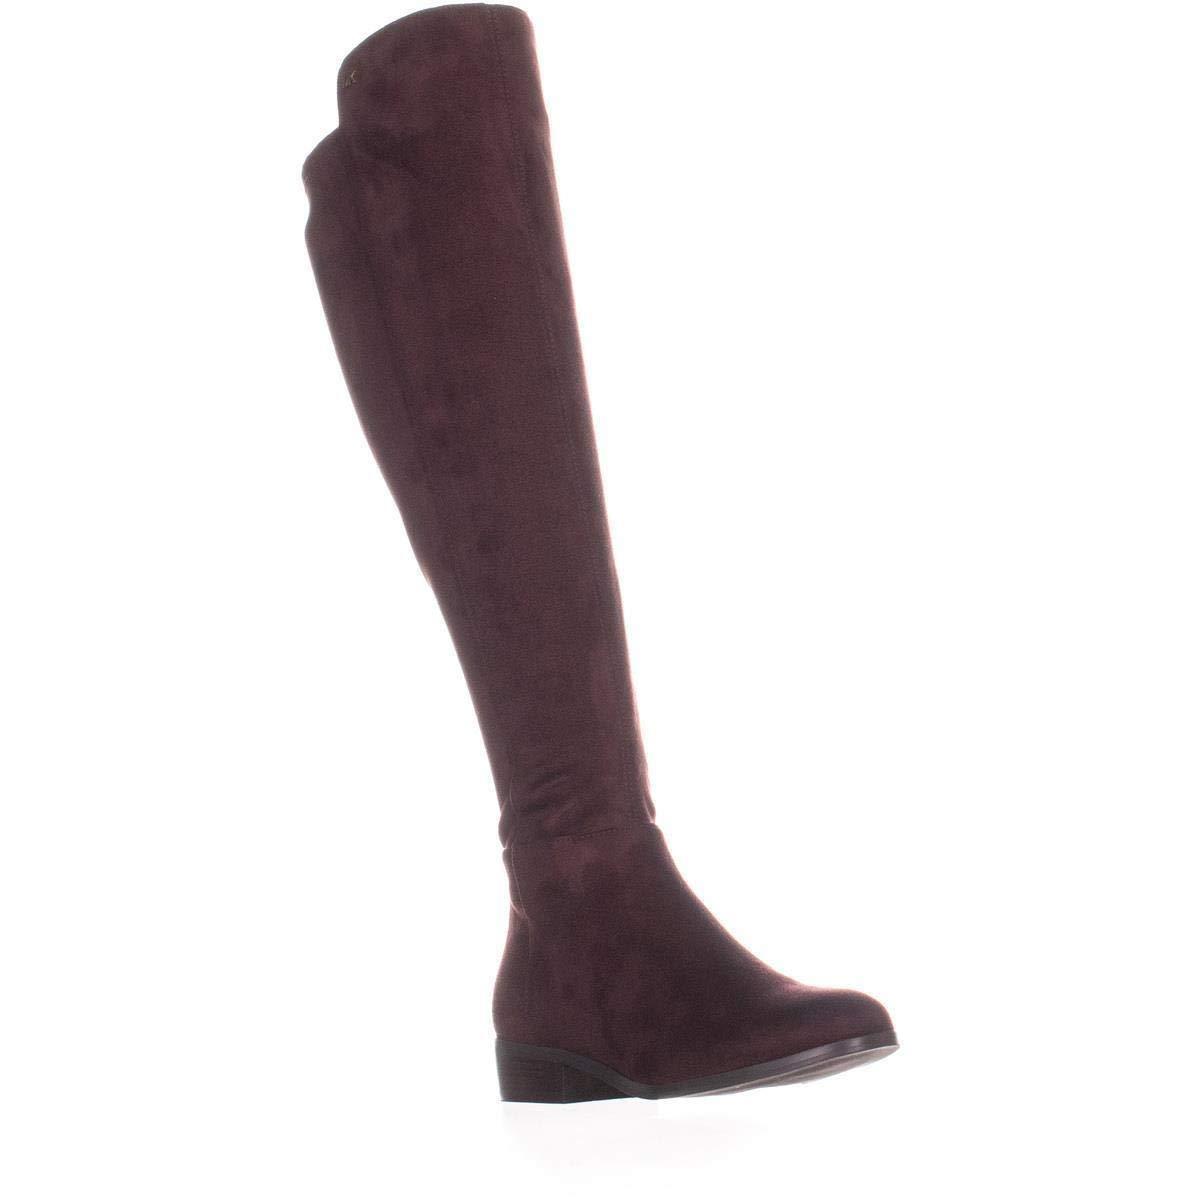 fdc4df7c2c2 Michael Kors Femmes Bromley Flat Boot Bottes  Amazon.fr  Chaussures et Sacs